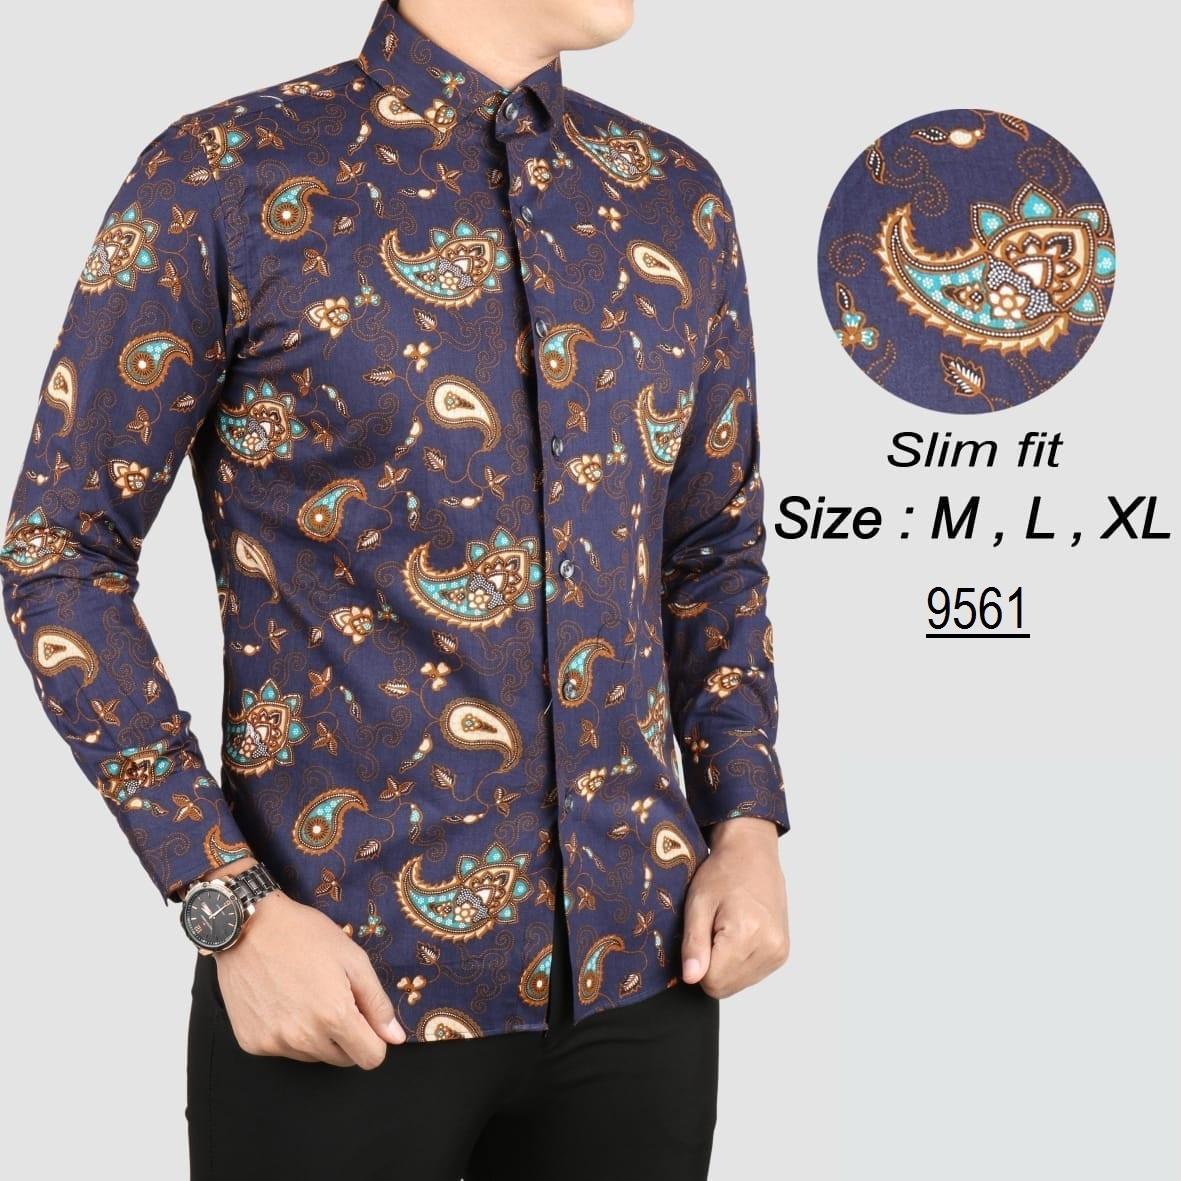 Baju Batik Modern Kemeja Pria Slim fit 9561